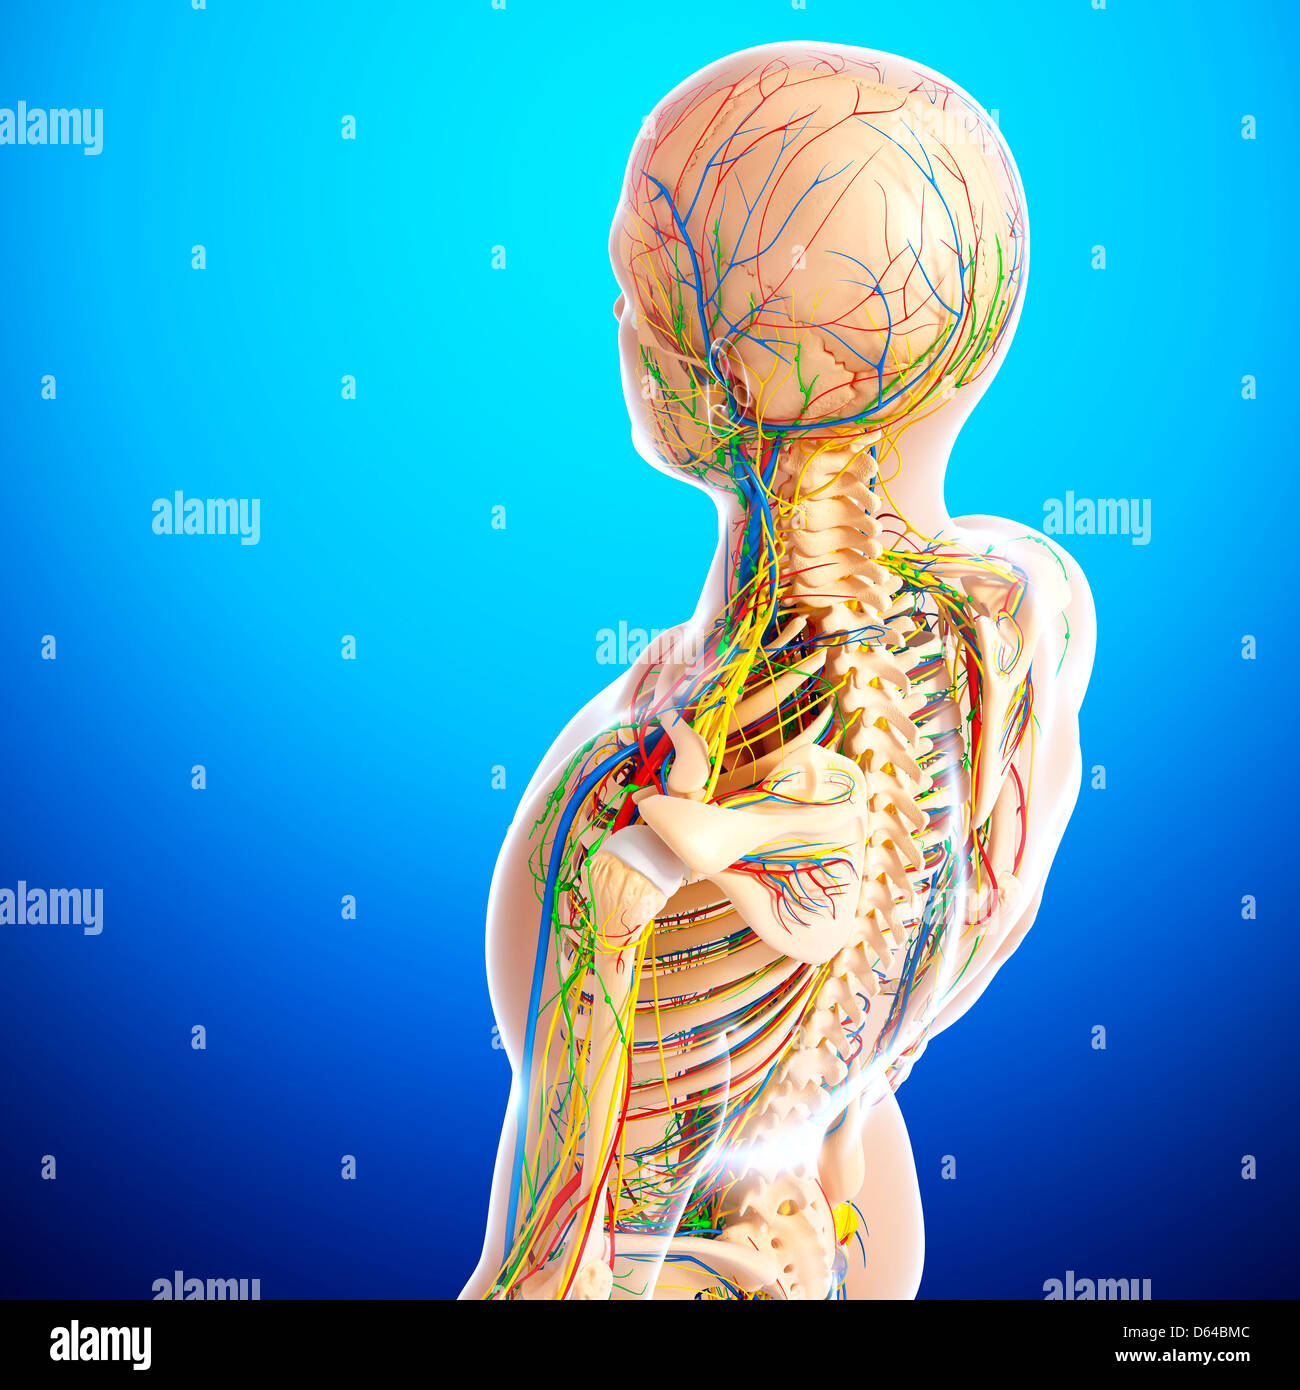 Upper body anatomy, artwork Stock Photo: 55416044 - Alamy